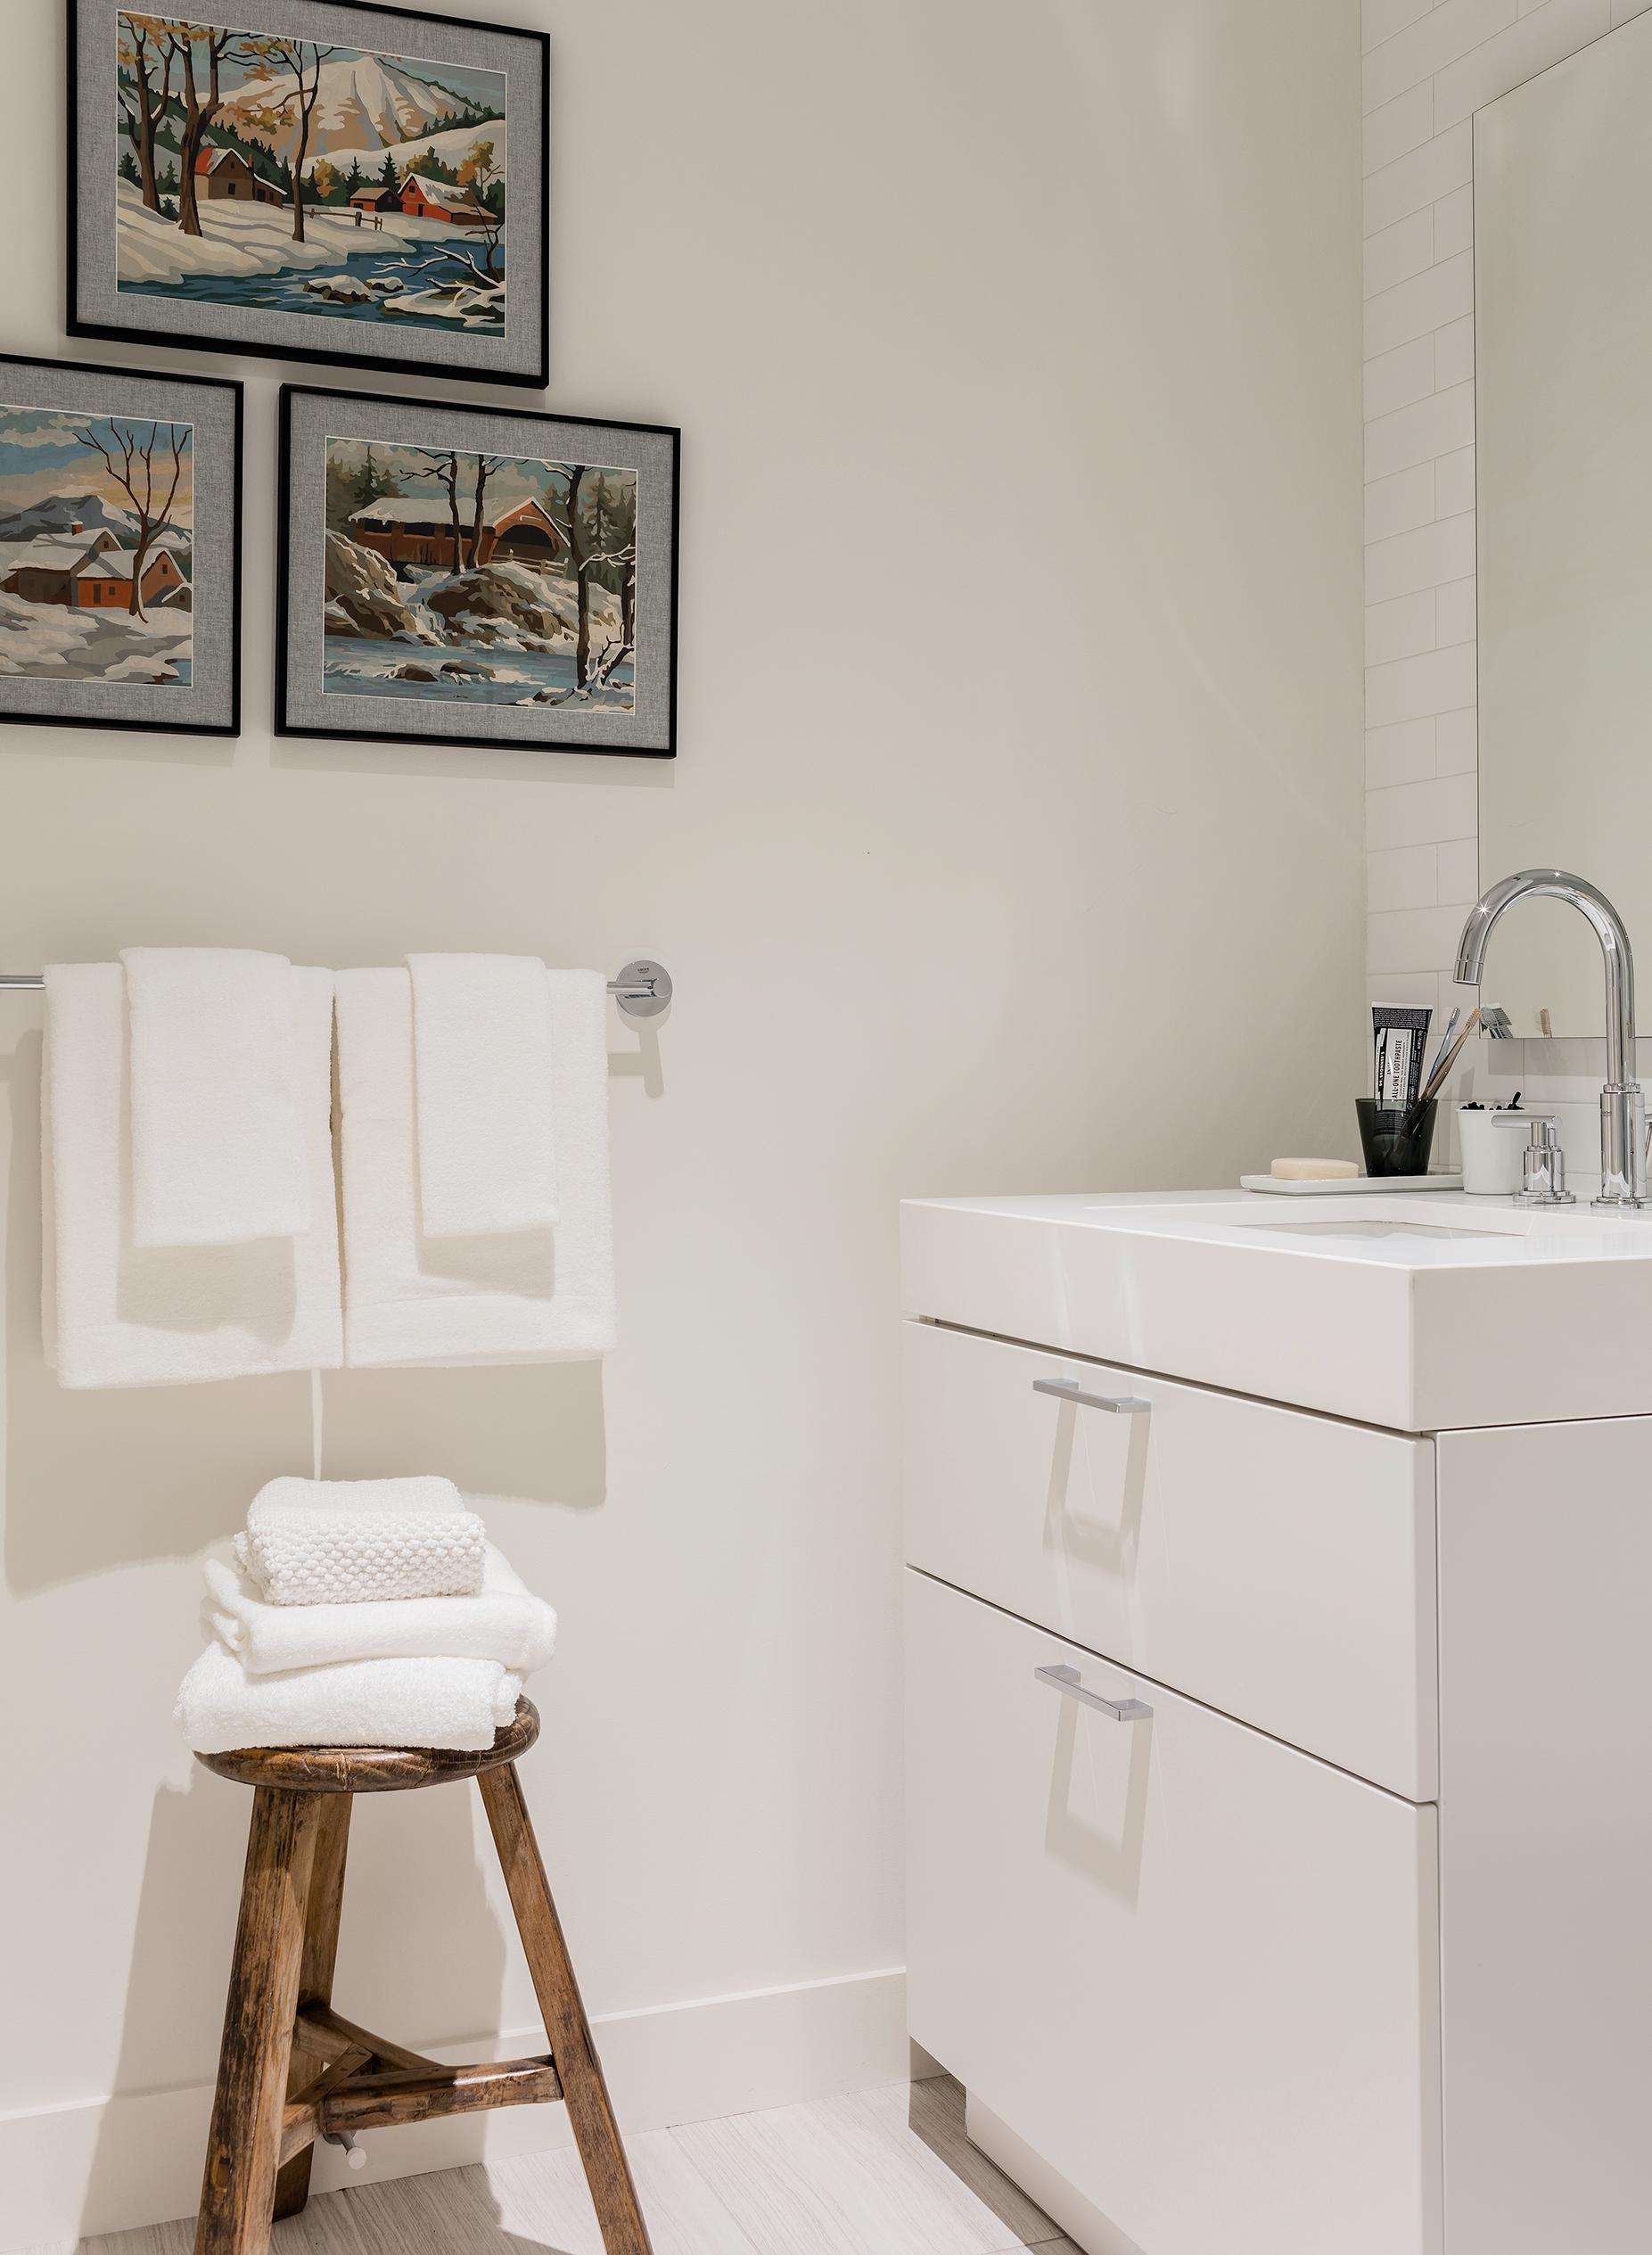 pier-4-model-guest-bathroom-hudson-interior-designs.jpg